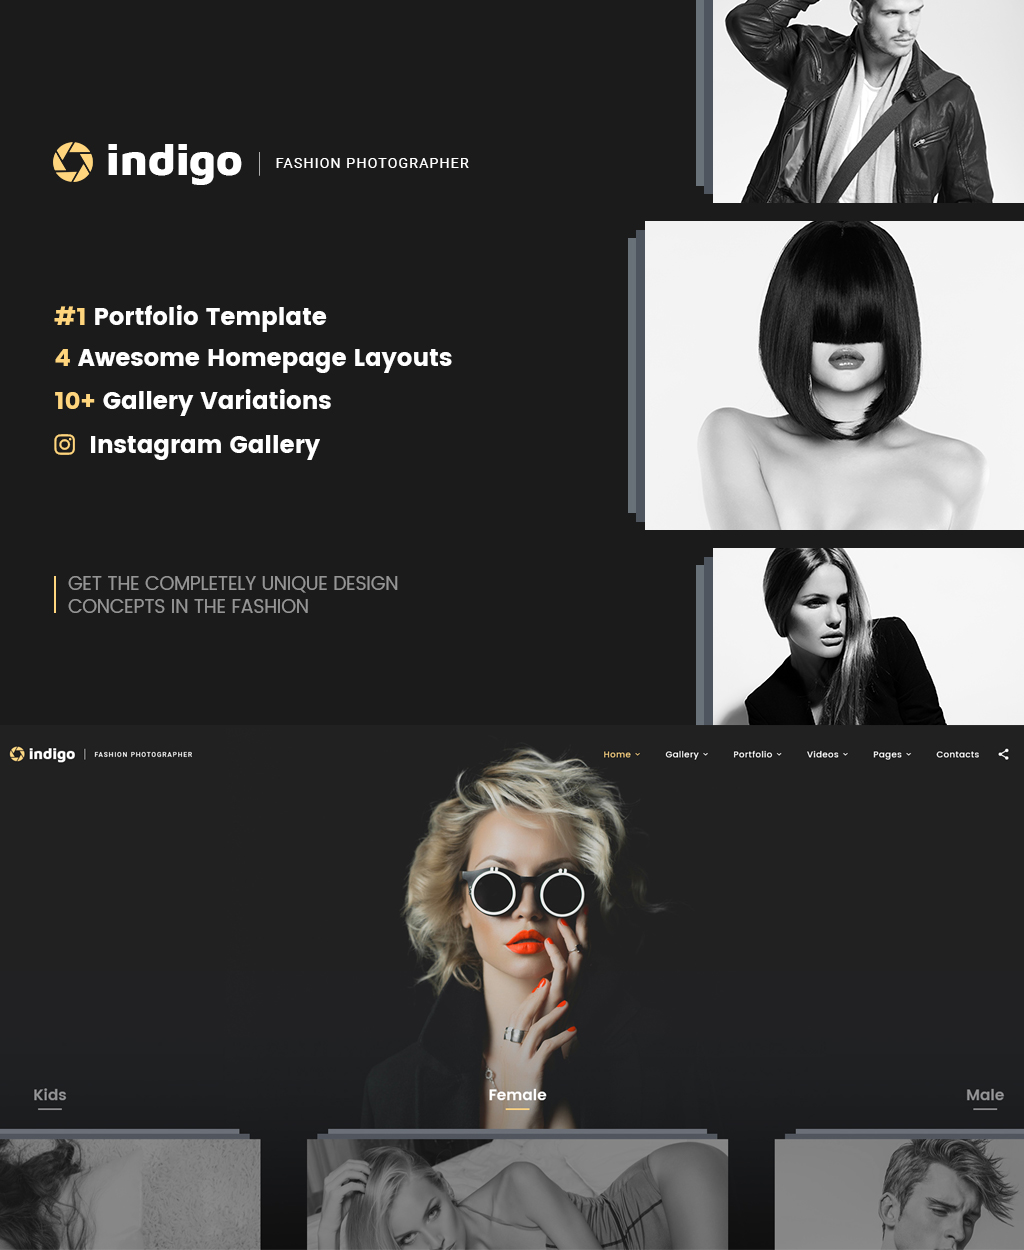 """Indigo - Fashion Photographer Responsive Multipage"" modèle web adaptatif #64403"